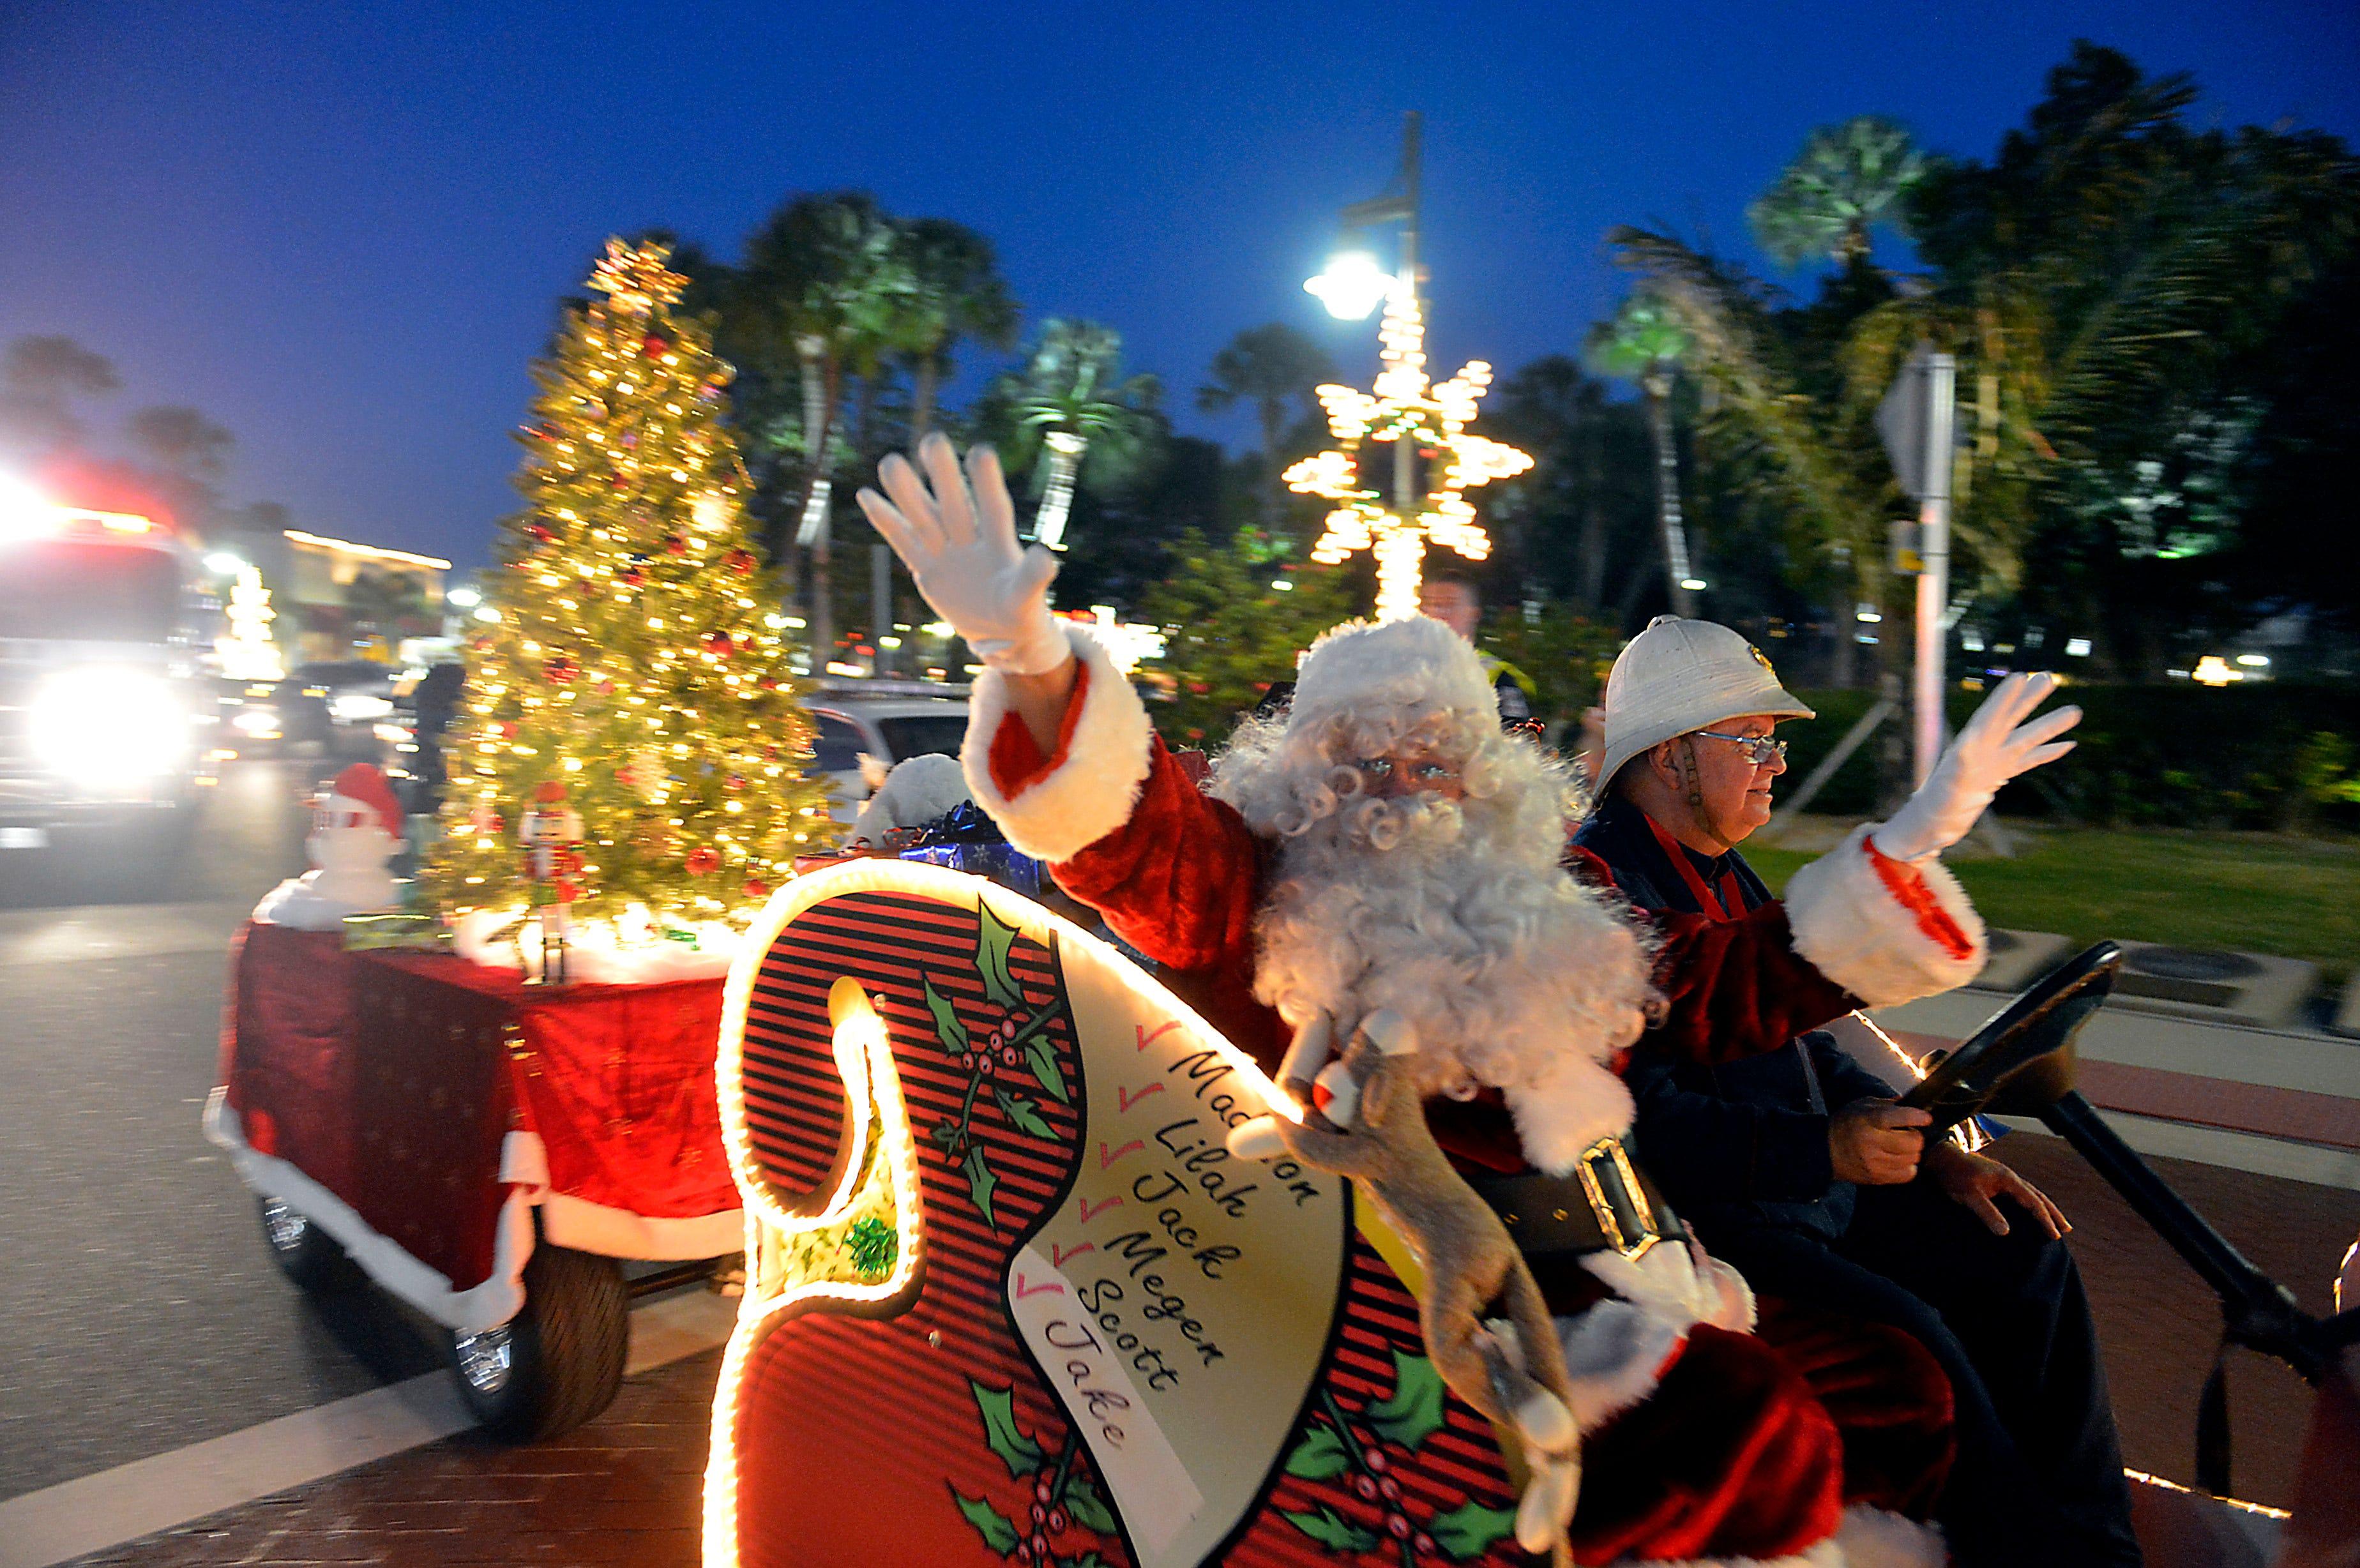 Christmas Lights In Tampa Florida 2021 Celebrate Christmas Season With These Activities In Sarasota Bradenton